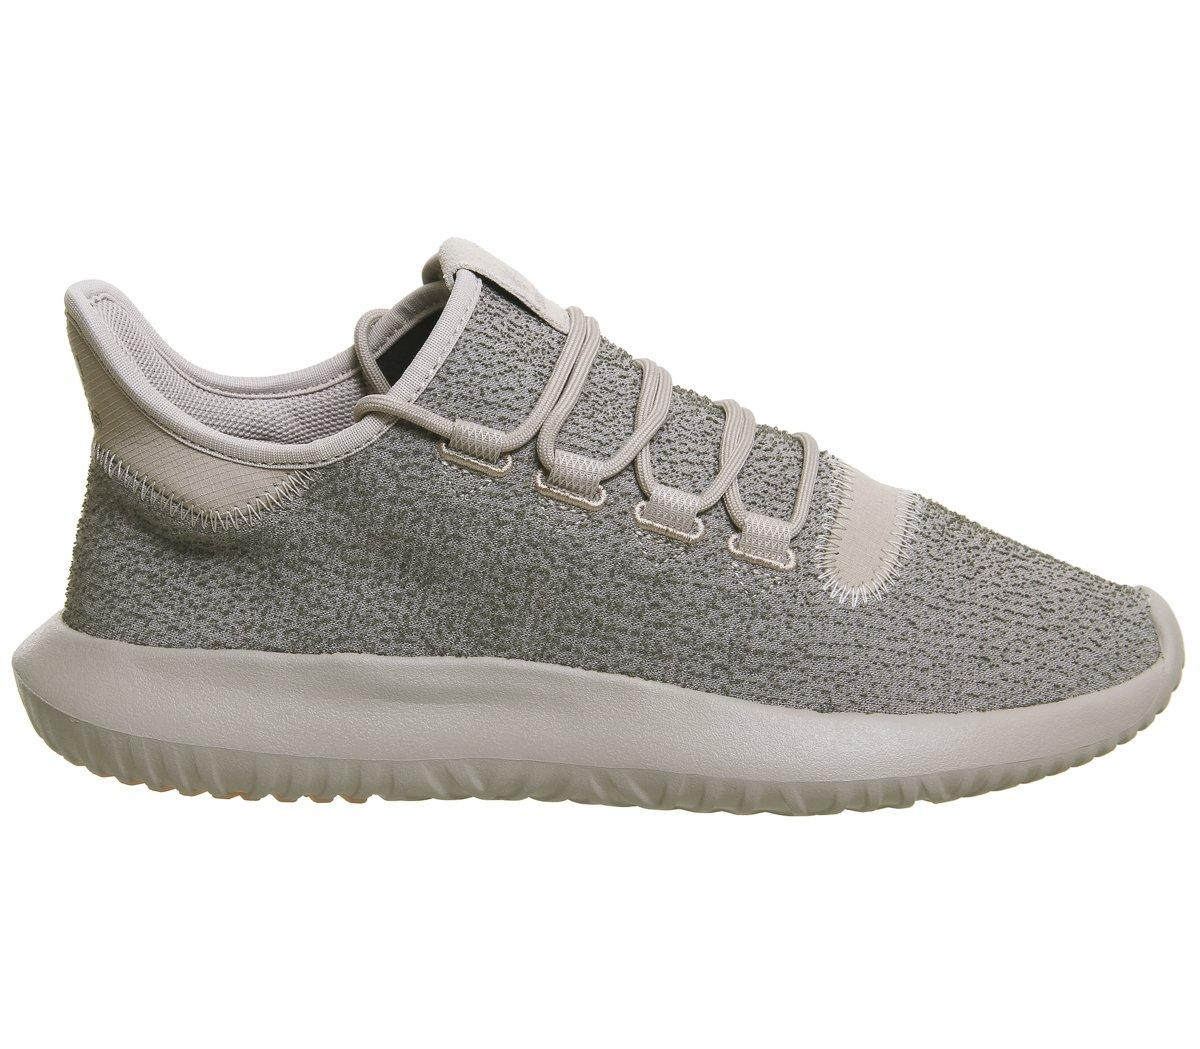 Adidas originali tubulare ombra scarpe b072mzbp7z b (m) noi donne